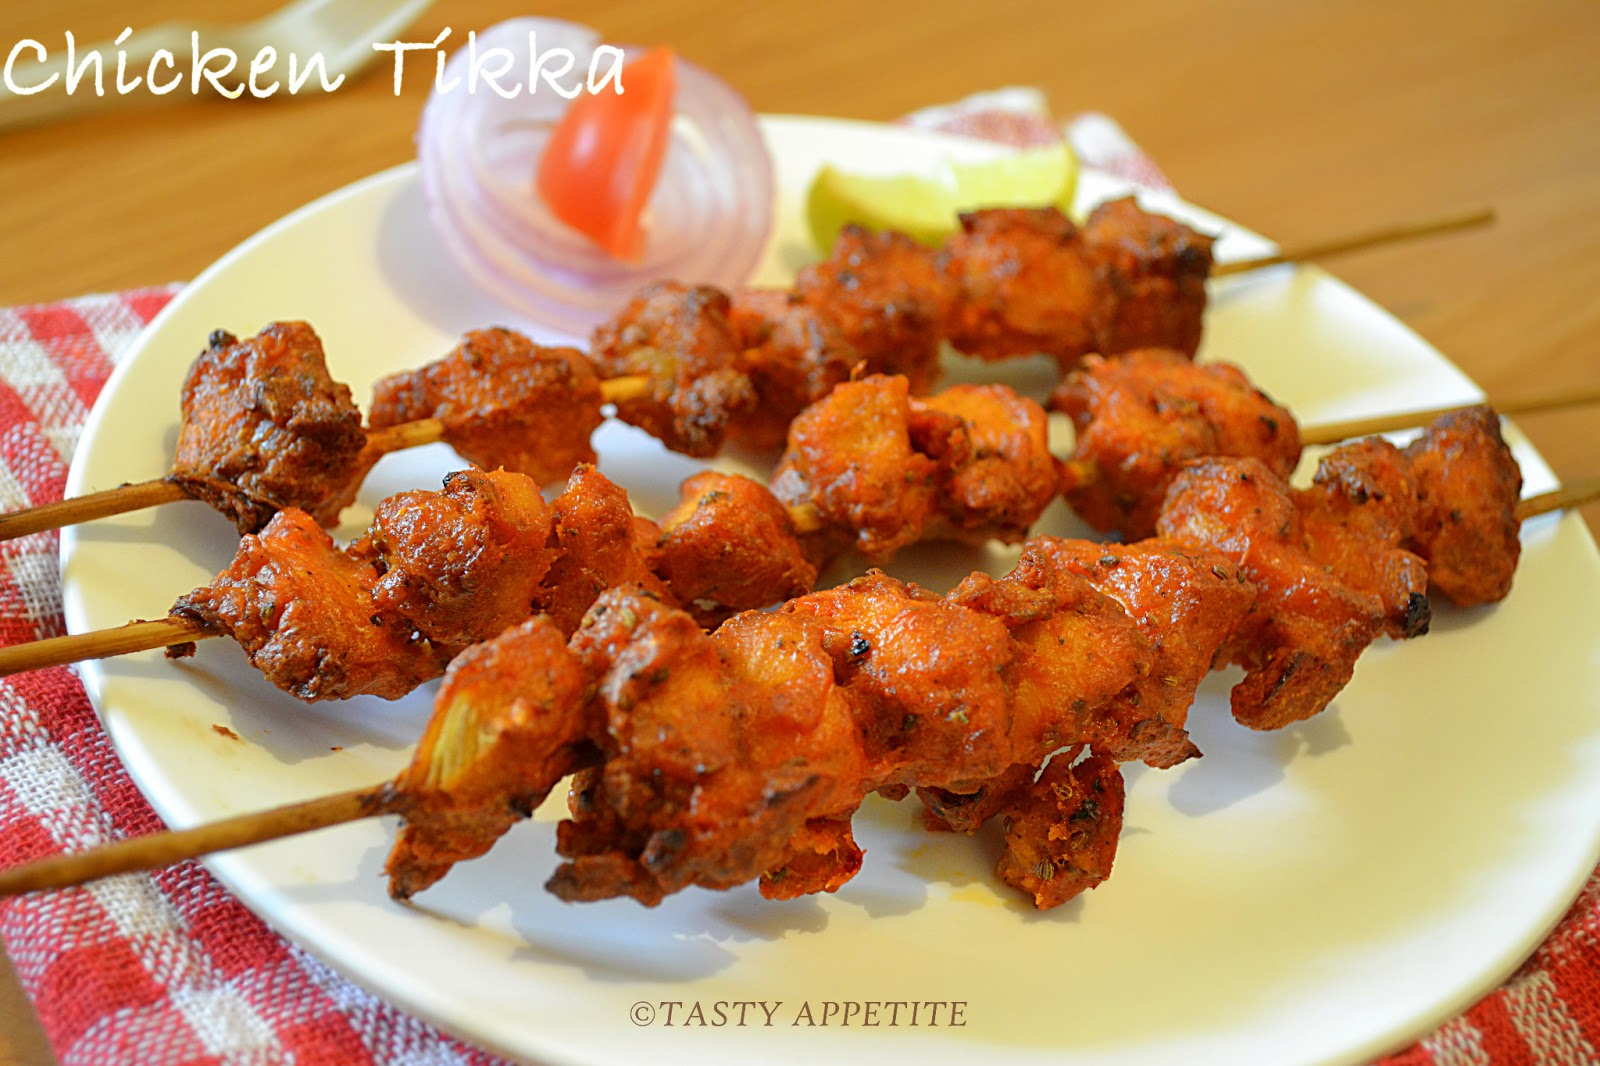 How to make Chicken Tikka / Easy Step-by-Step Recipe: